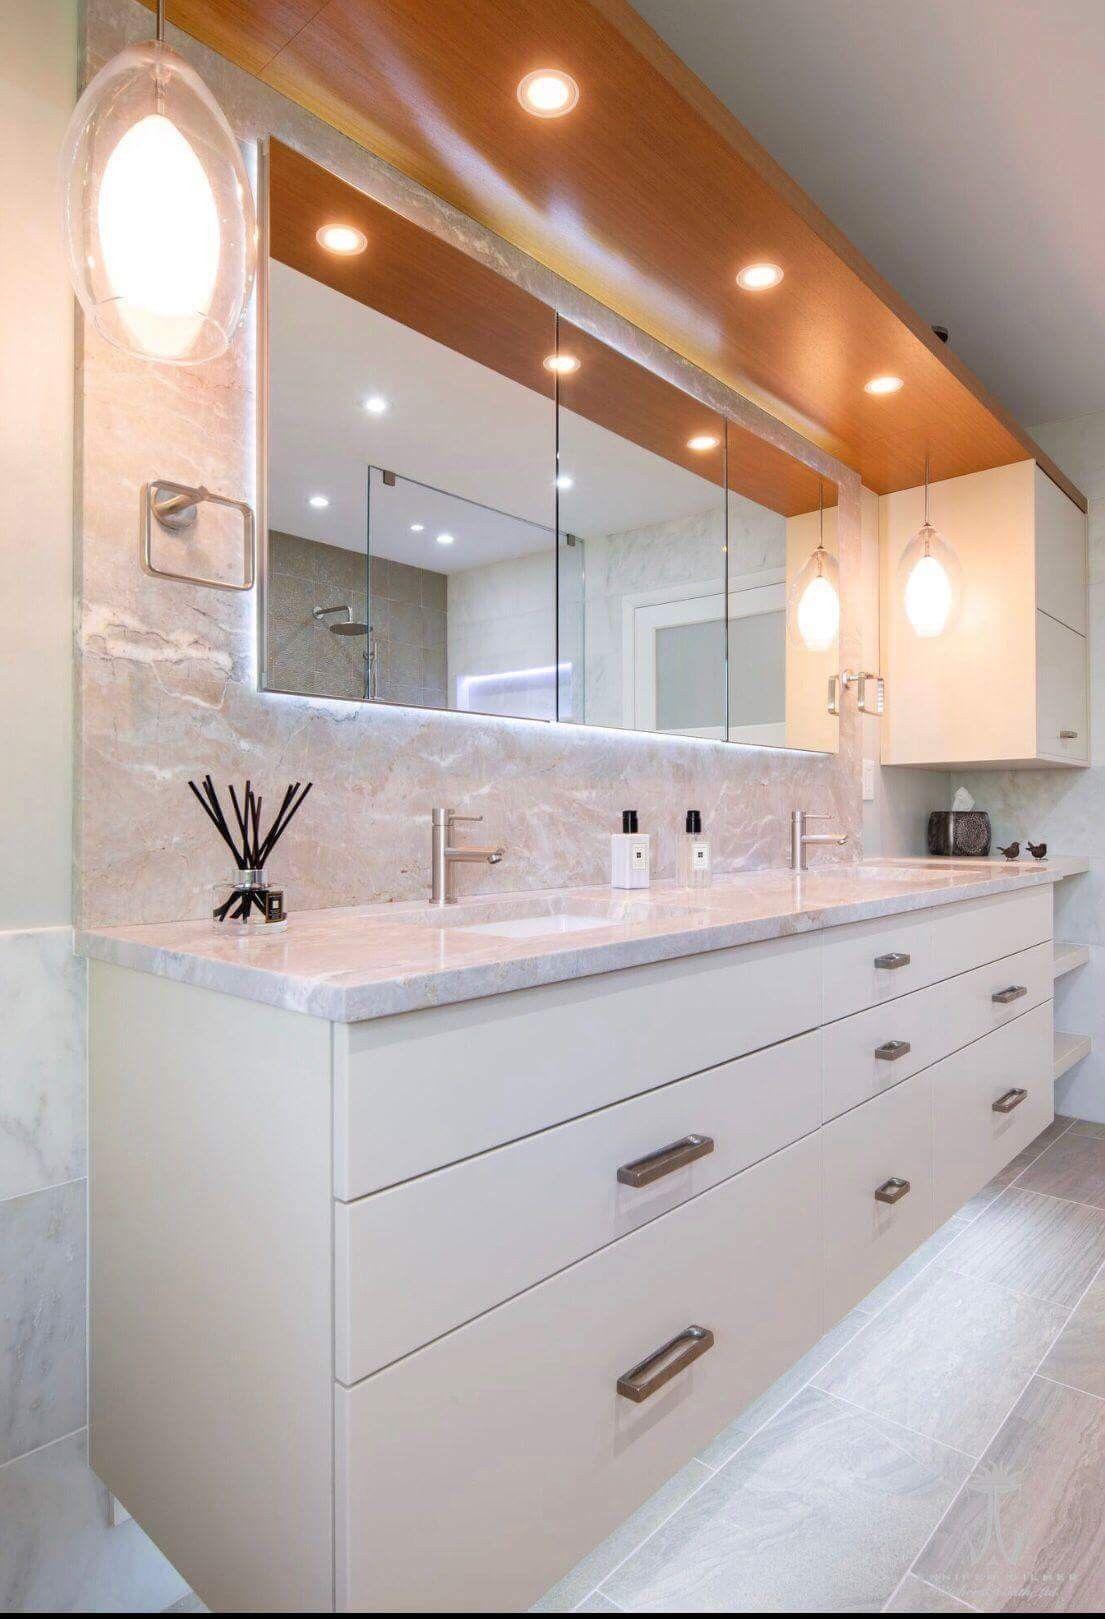 Marvelous Bathroom Designed By Meghan4jgkb The Vanity Cabinetry